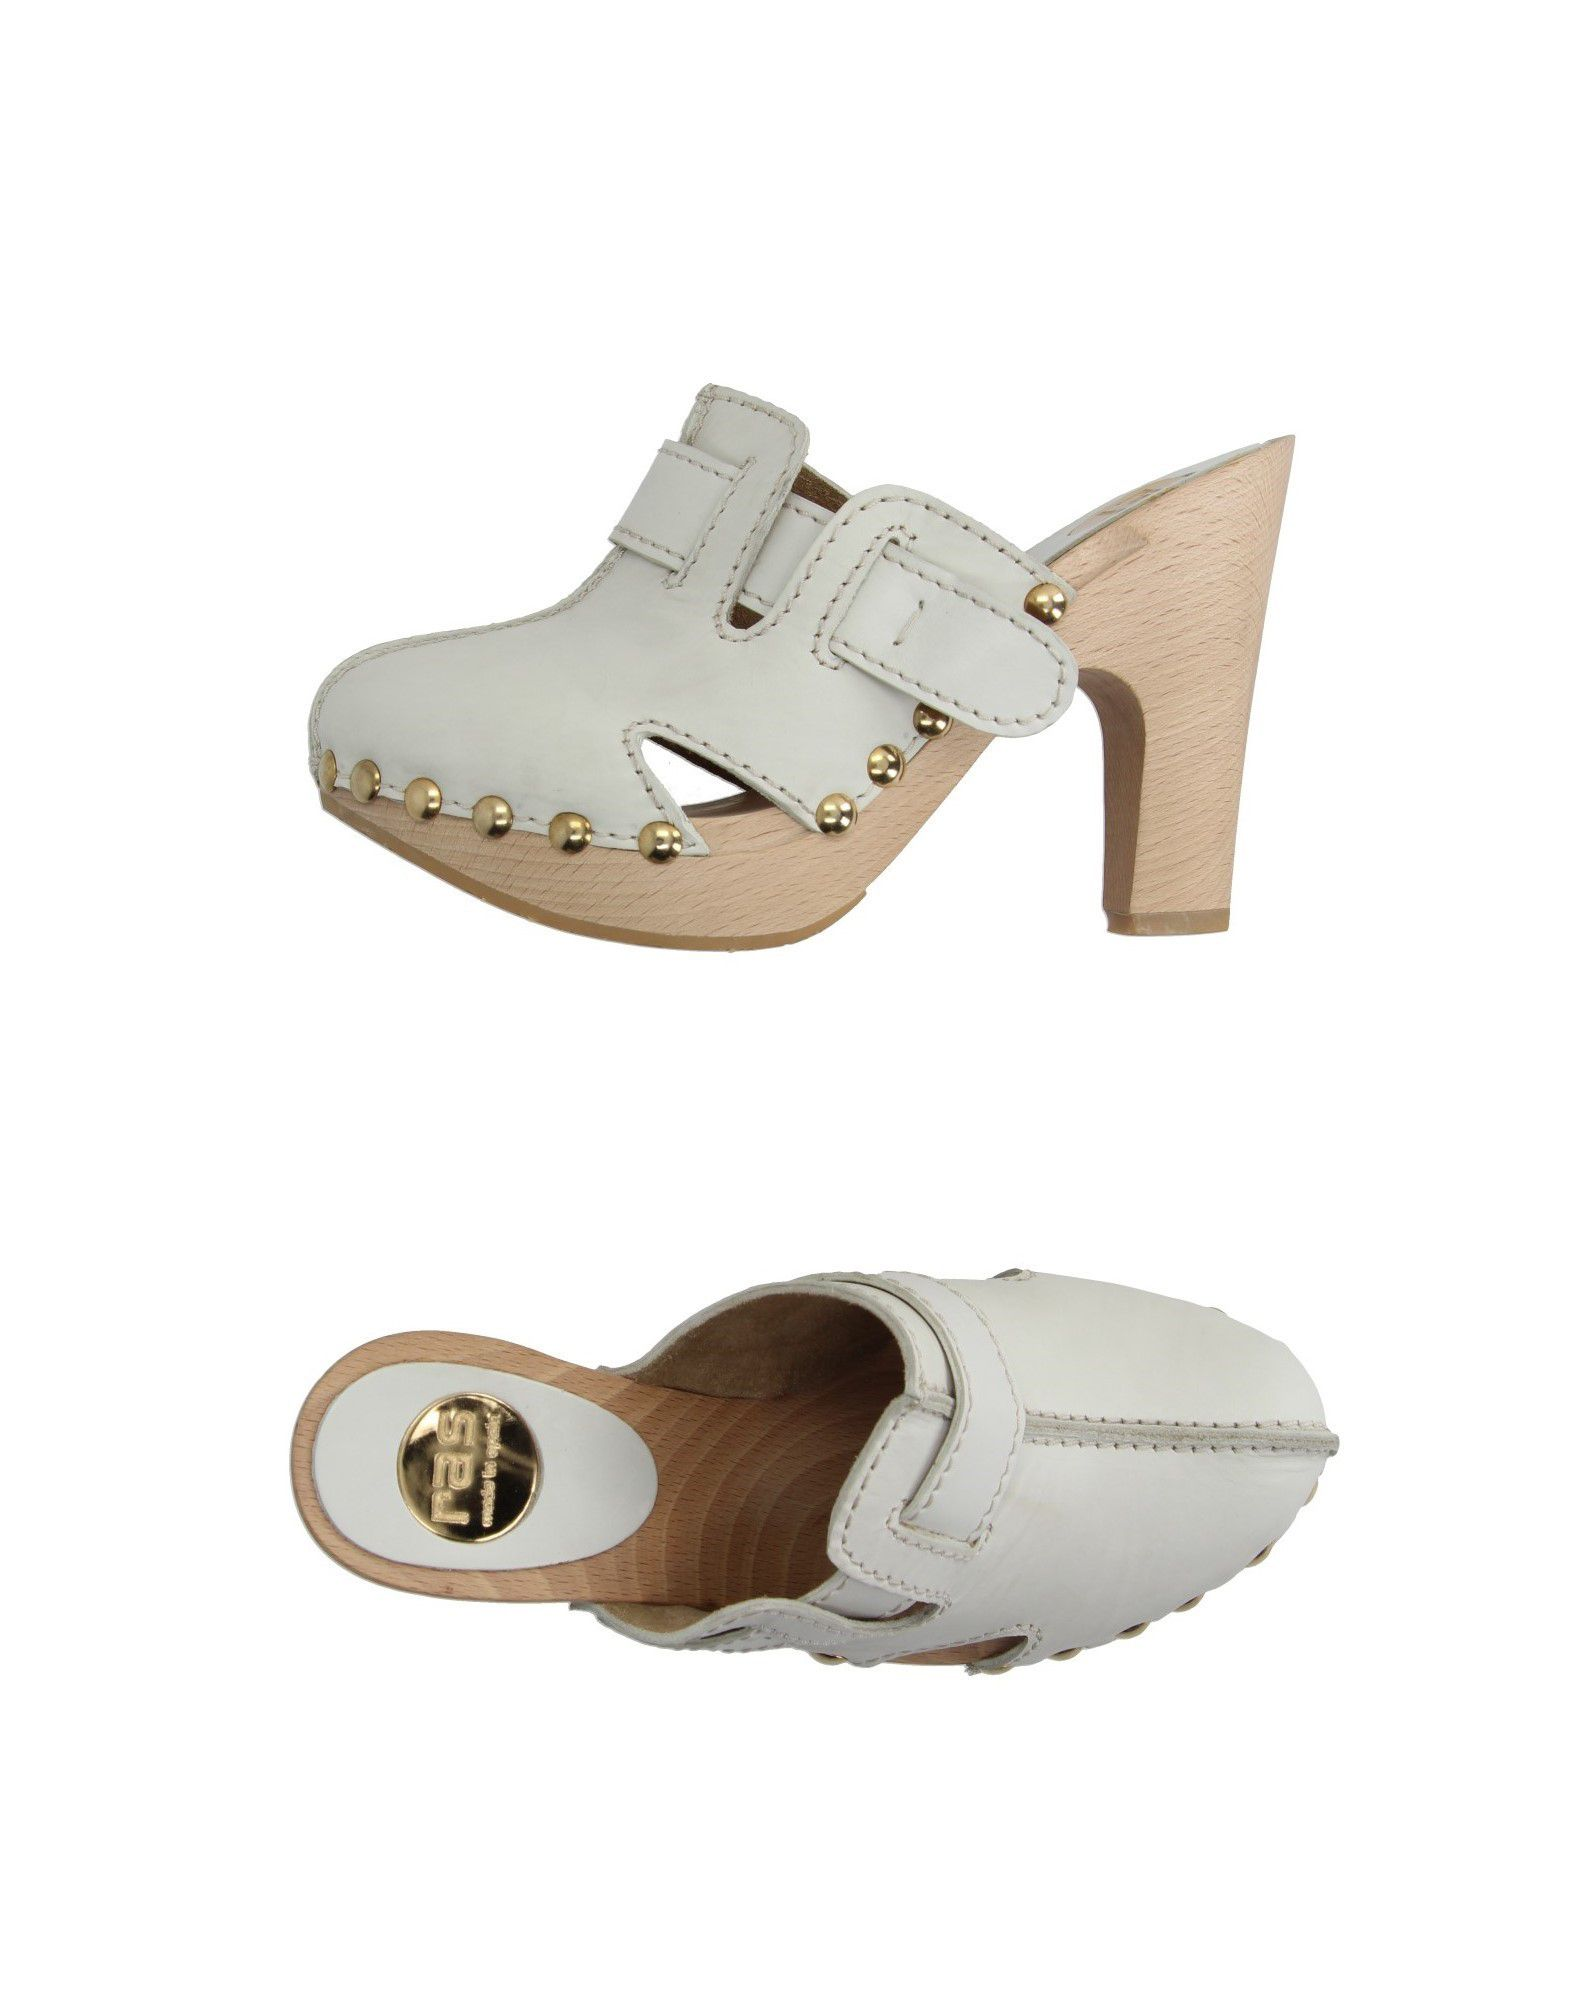 RAS Damen Mules & Clogs Farbe Weiß Größe 5